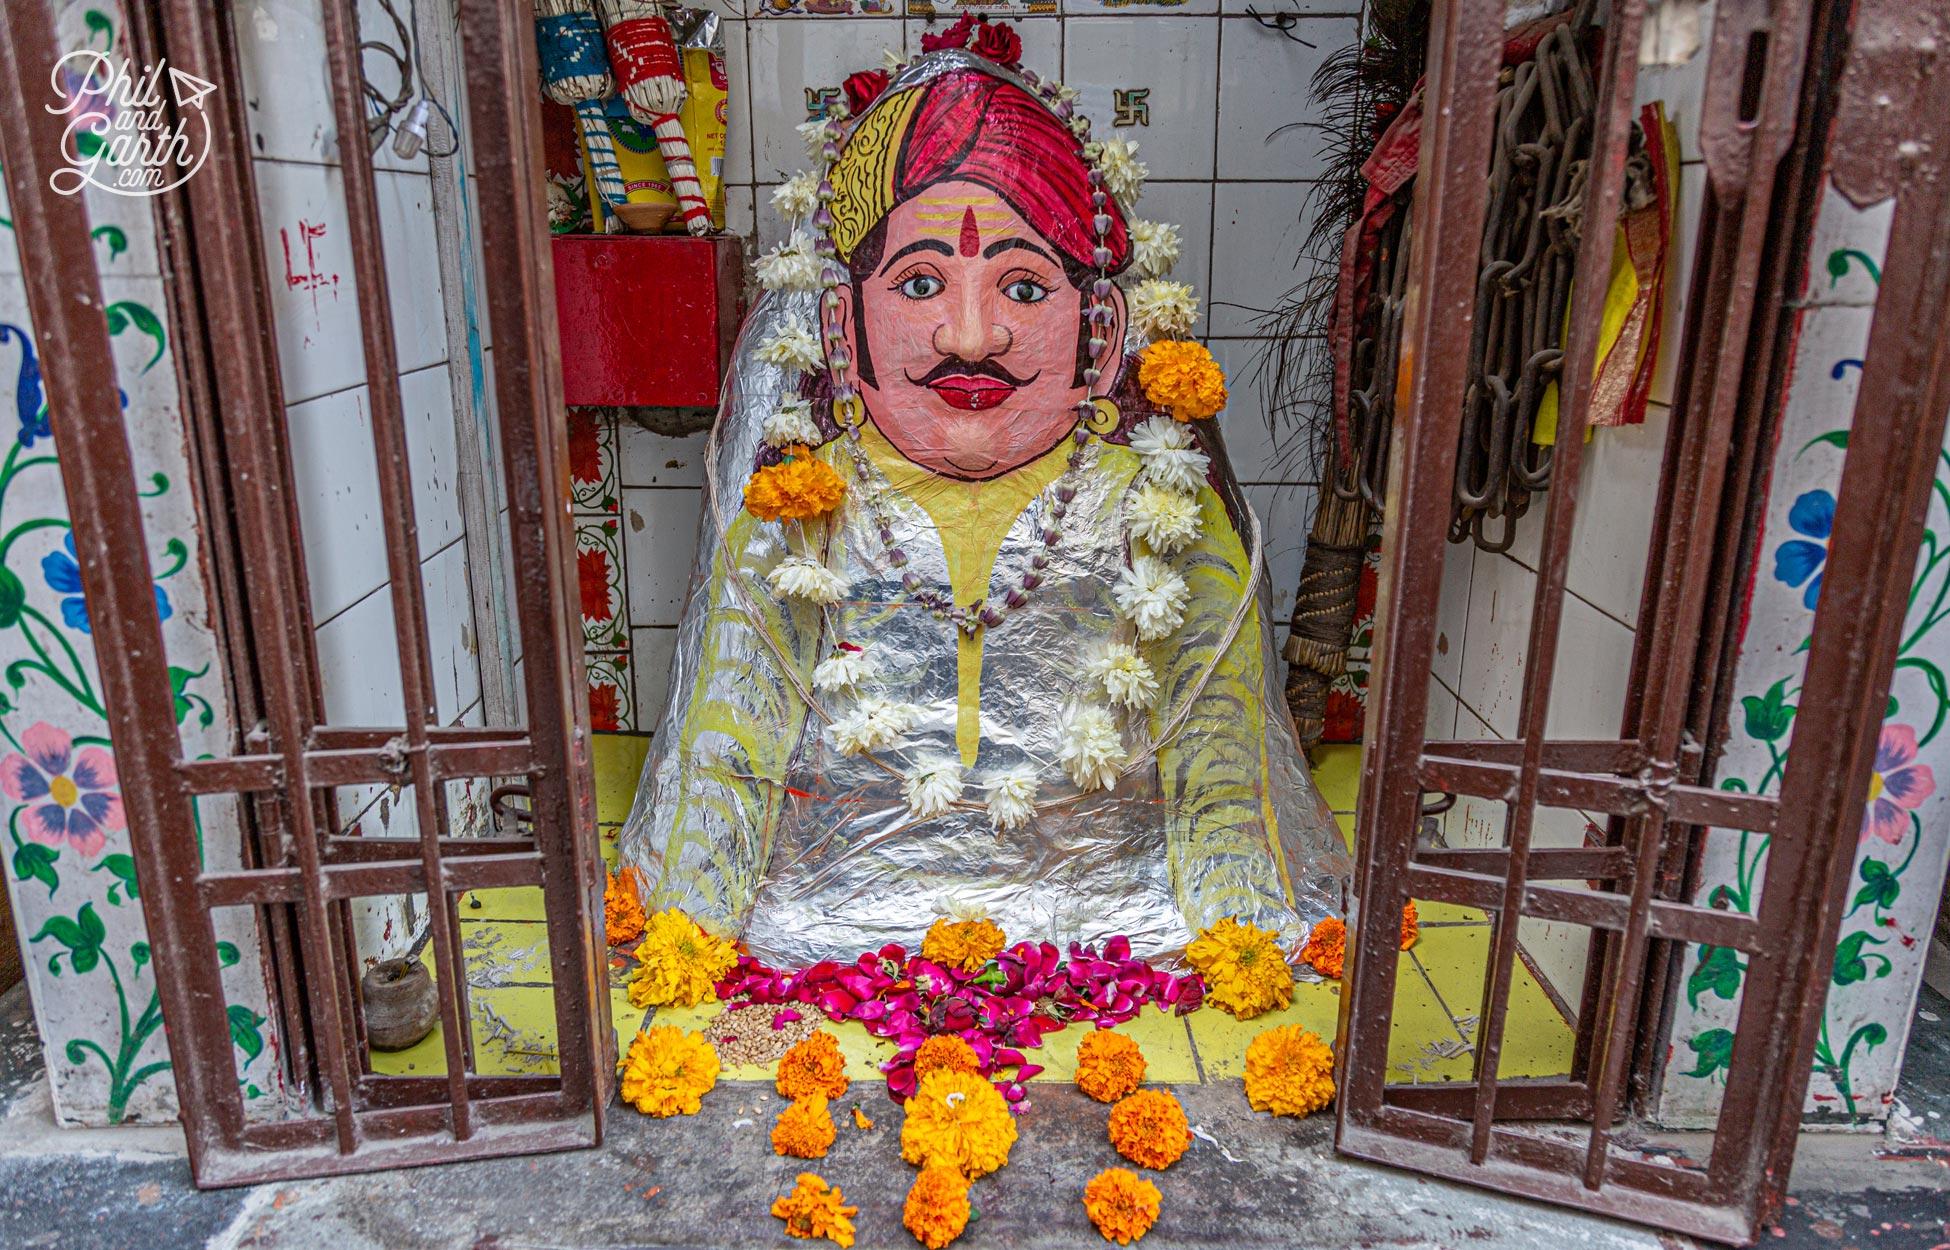 We came across many small hindu shrines in doorways